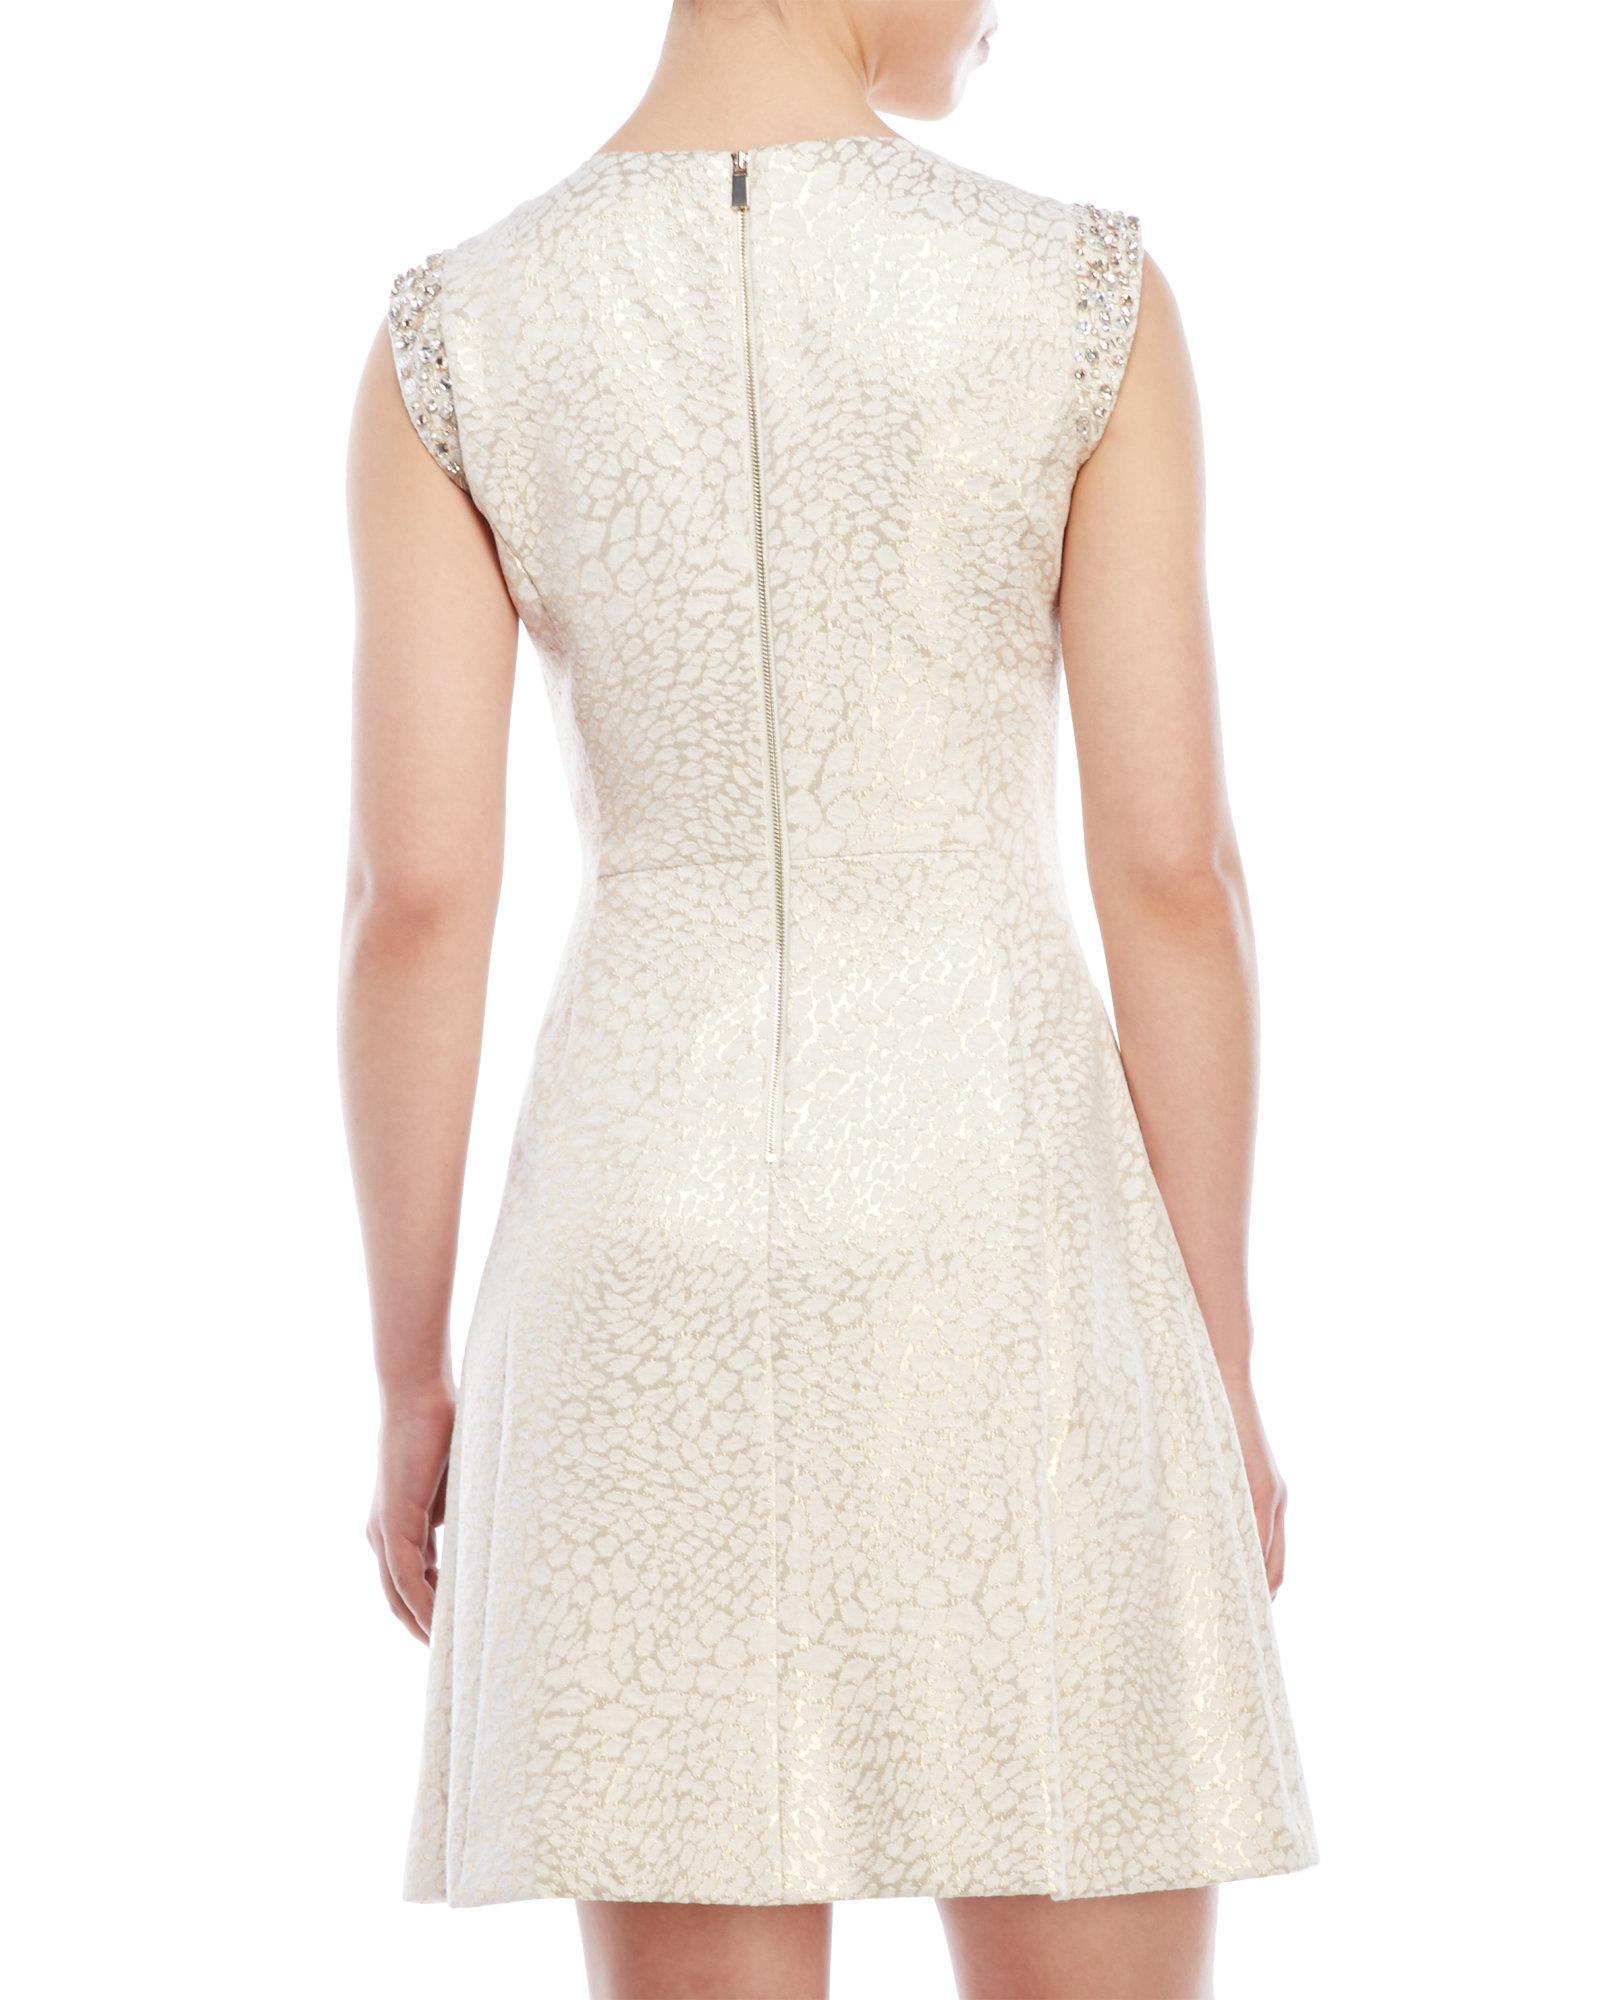 Lyst Vince Camuto Metallic Jacquard Cap Sleeve Dress In